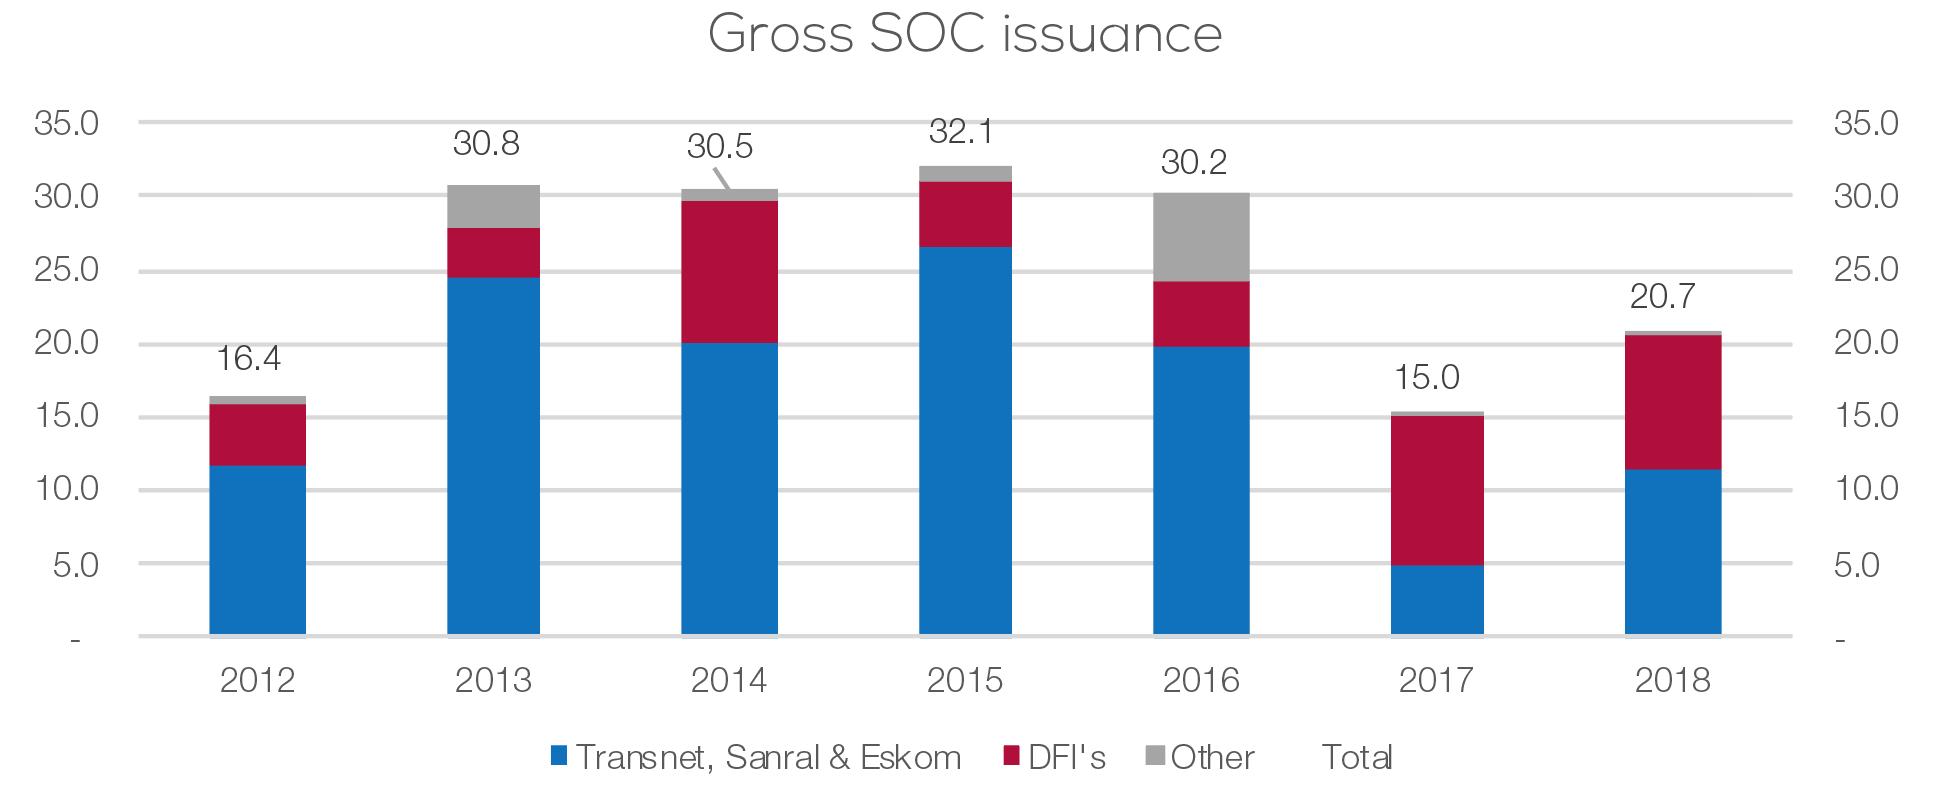 Gross SOC issuance